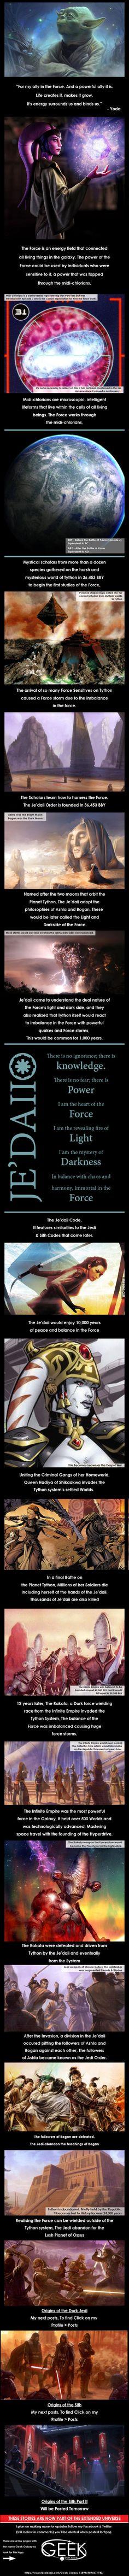 Origins of the Jedi - 9GAG